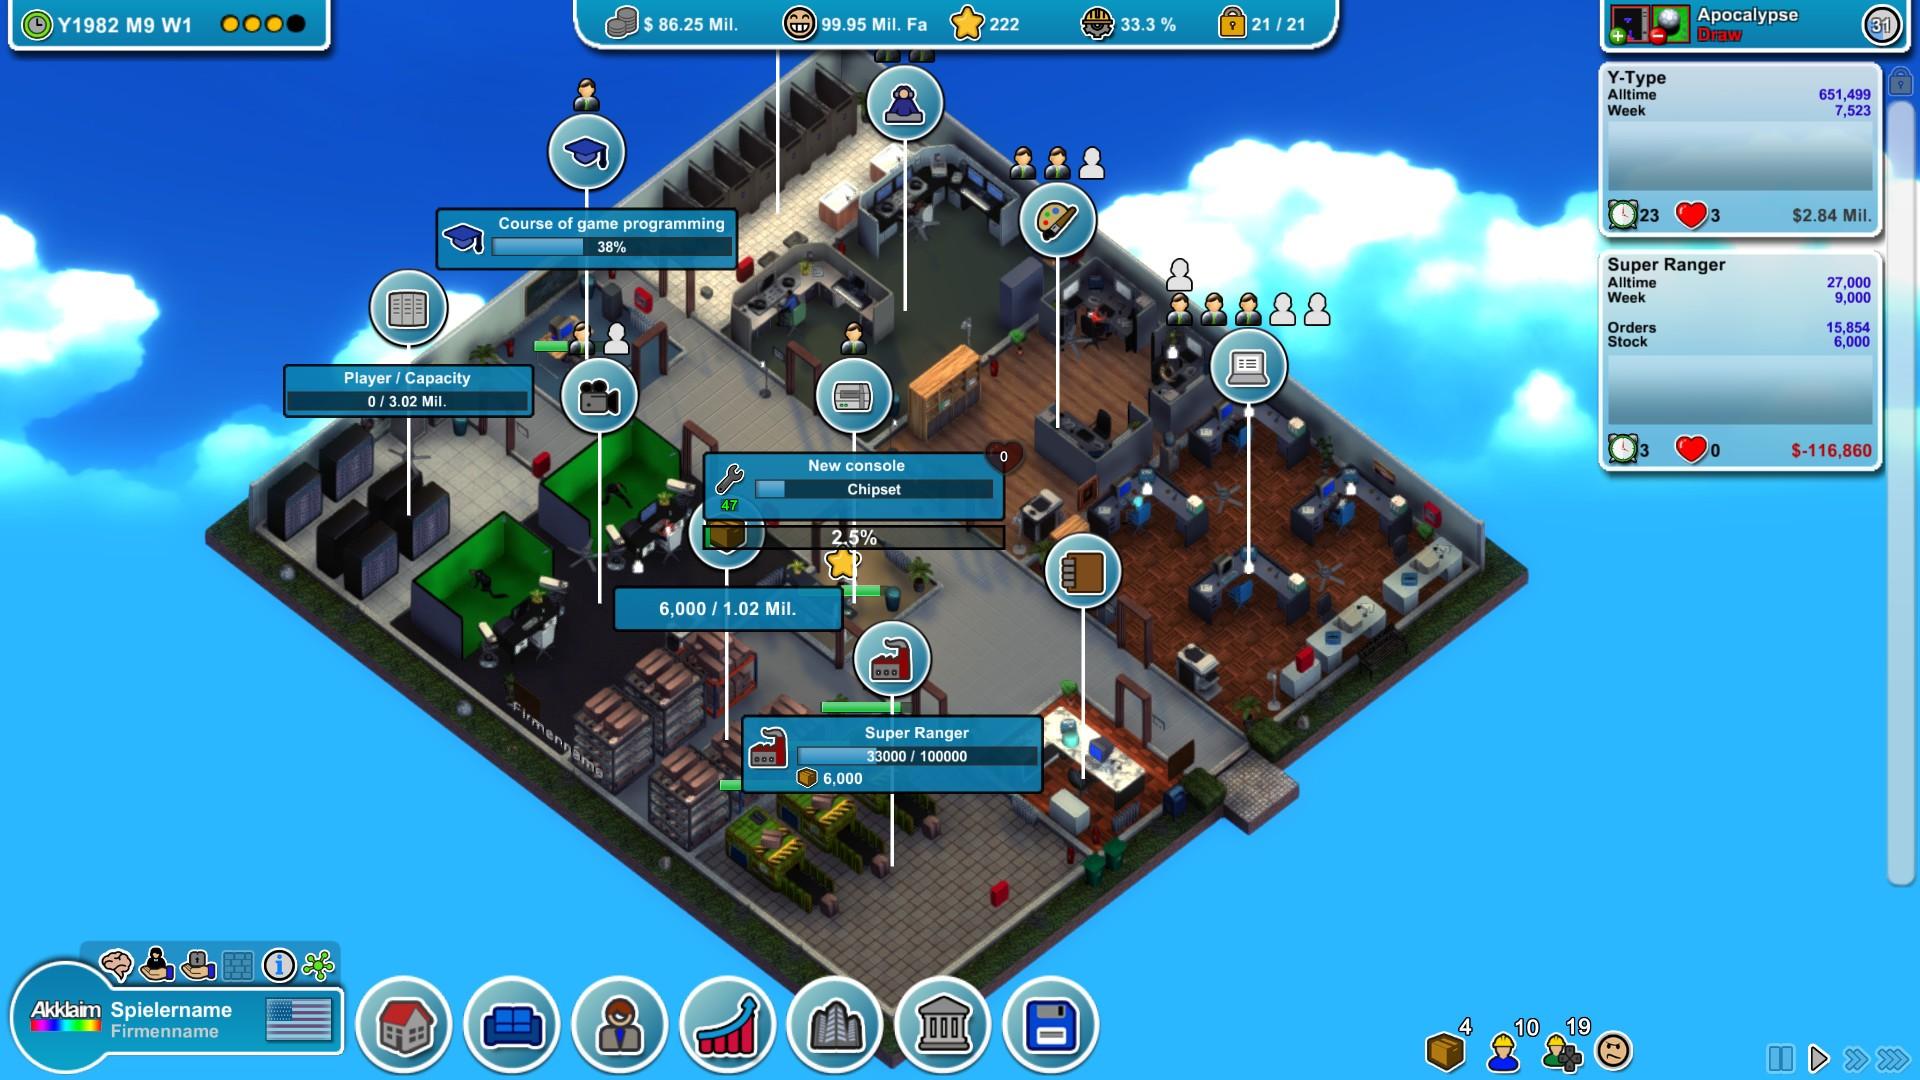 Game Dev Studio Screenshot 2